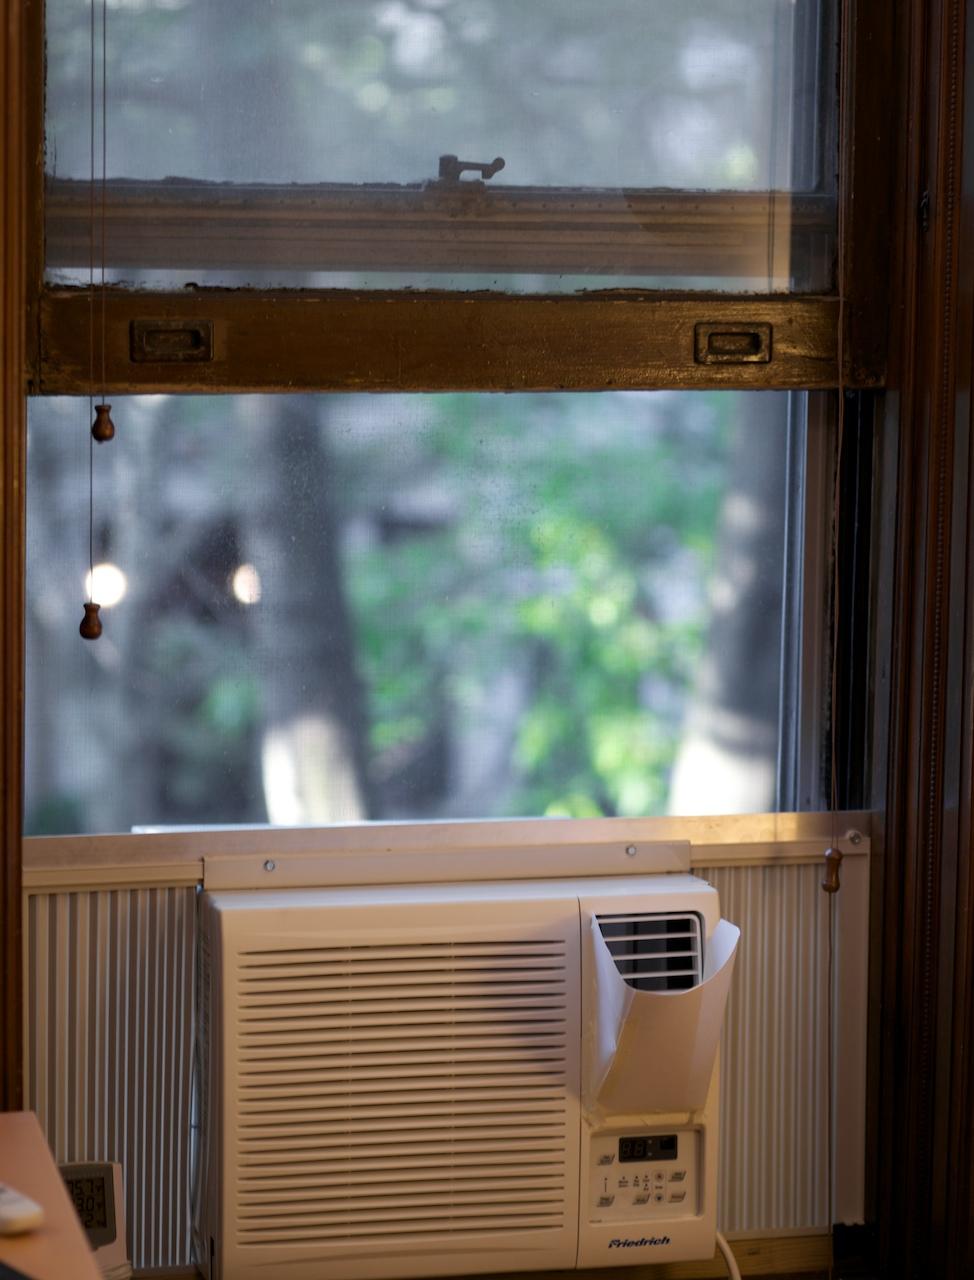 Small Air Conditioner Window Unit